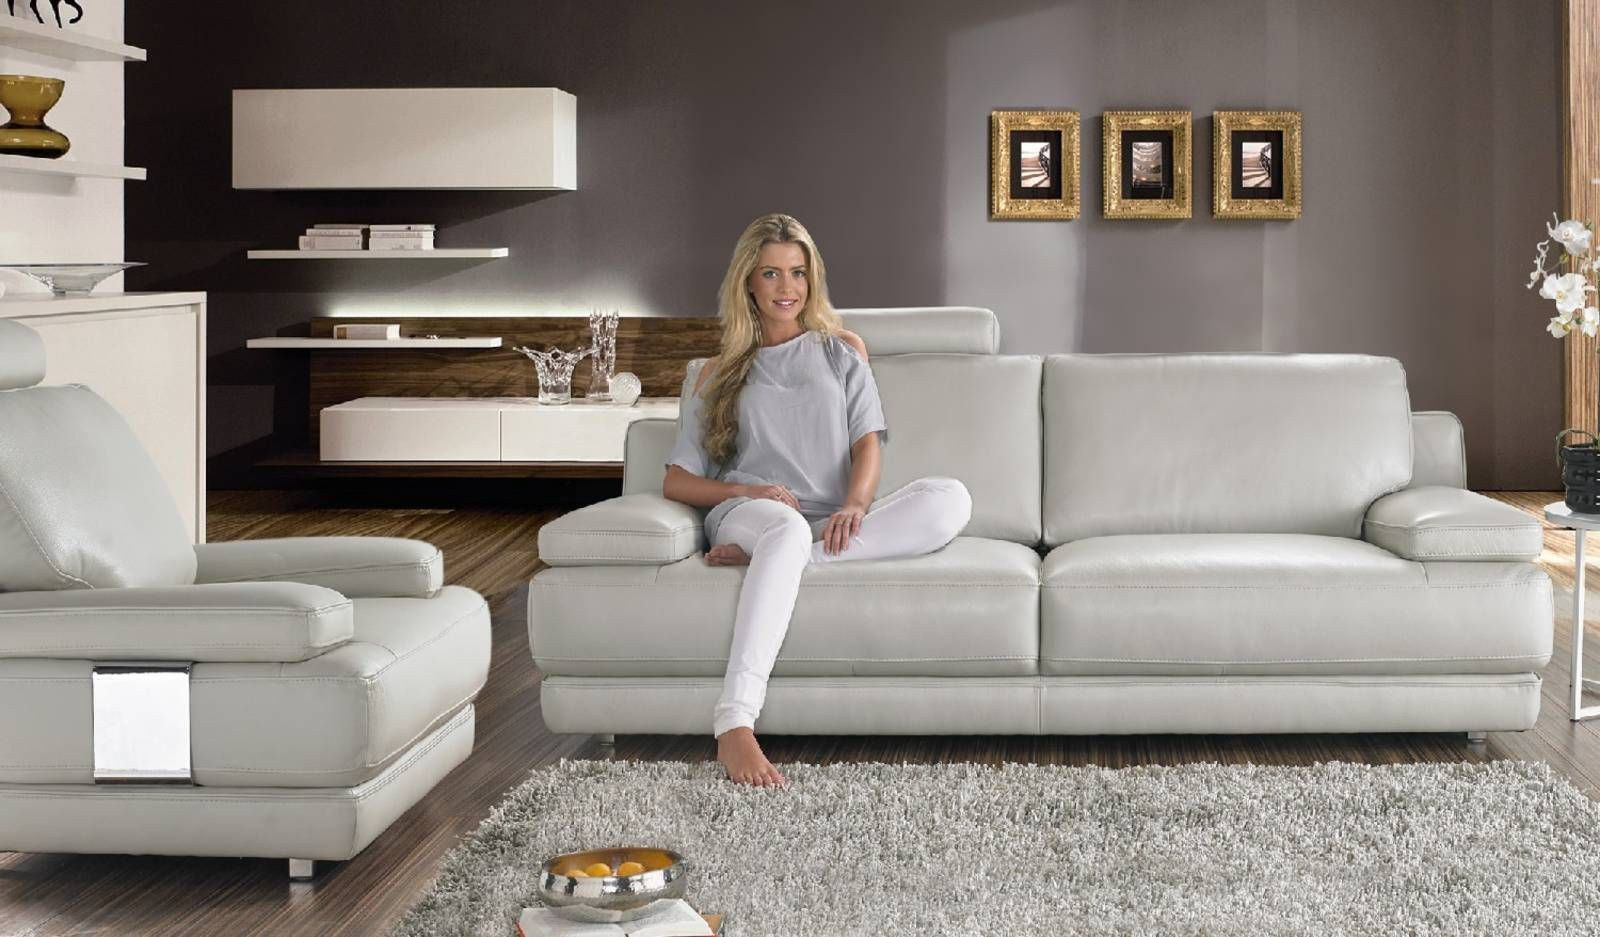 Paloma Sofa Sofology Simmons Flannel Charcoal Barcetto Home Ideas Leather Living Room